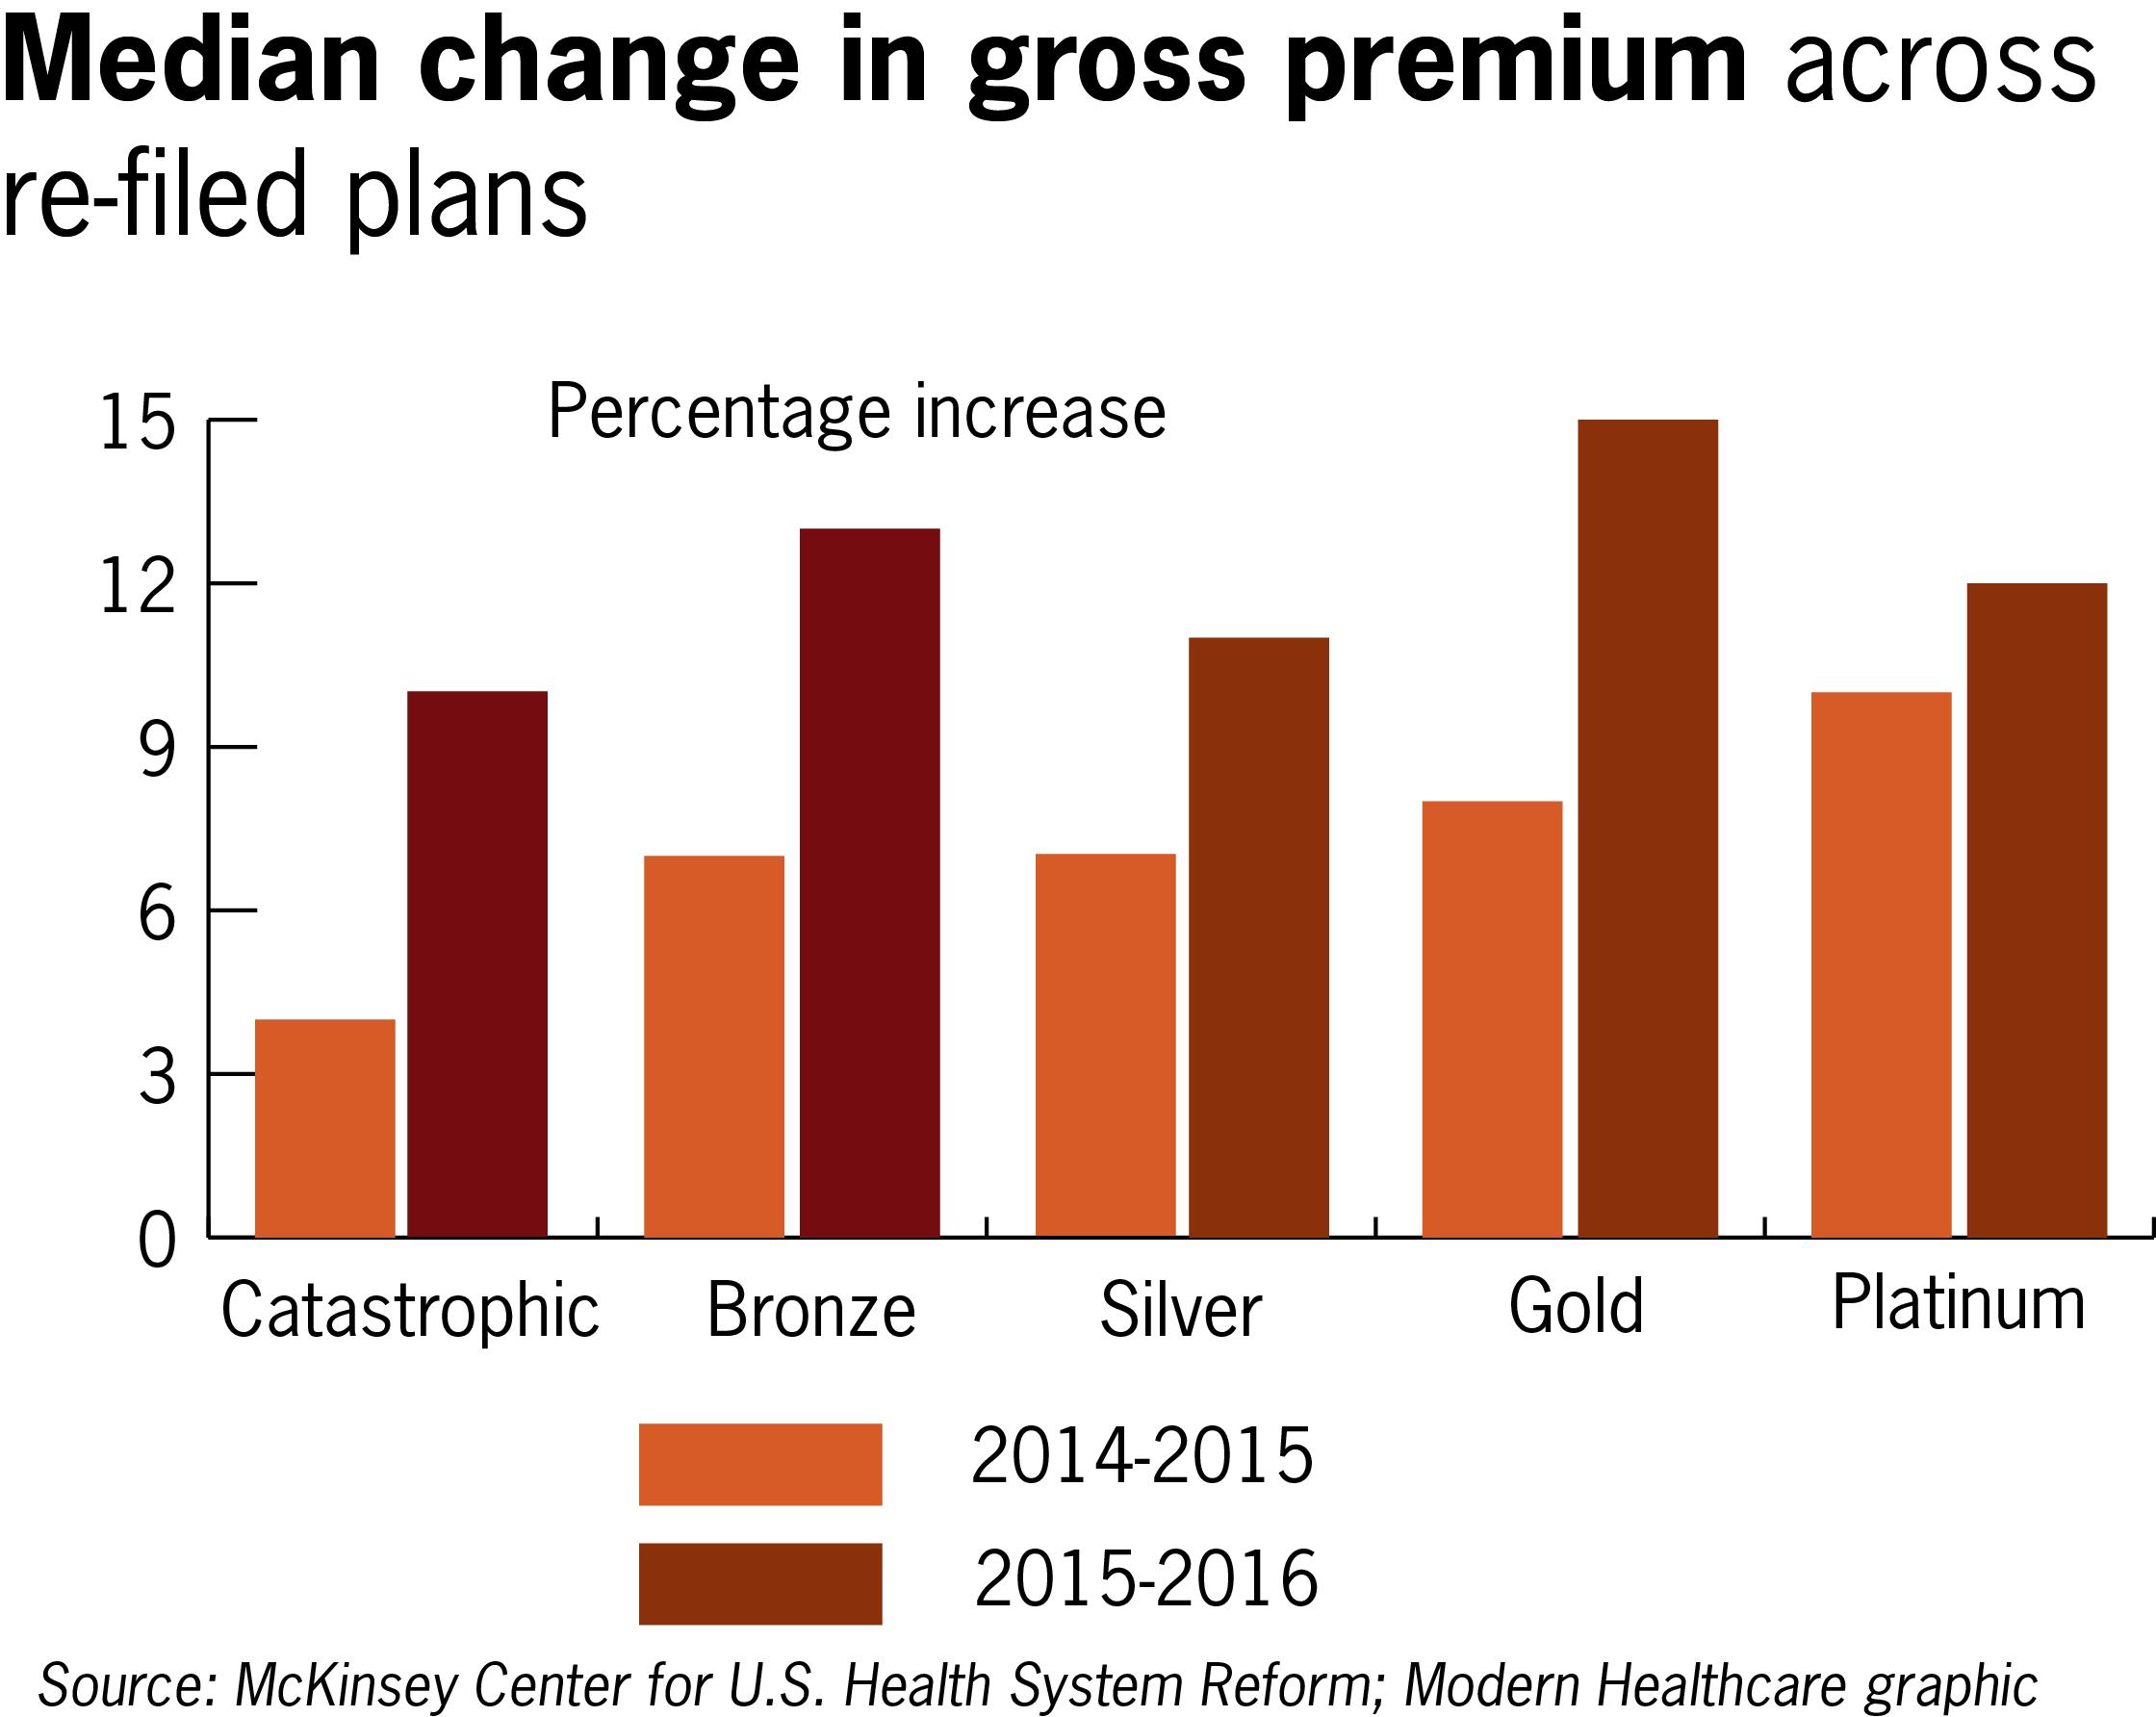 Exchange plans - median premium change